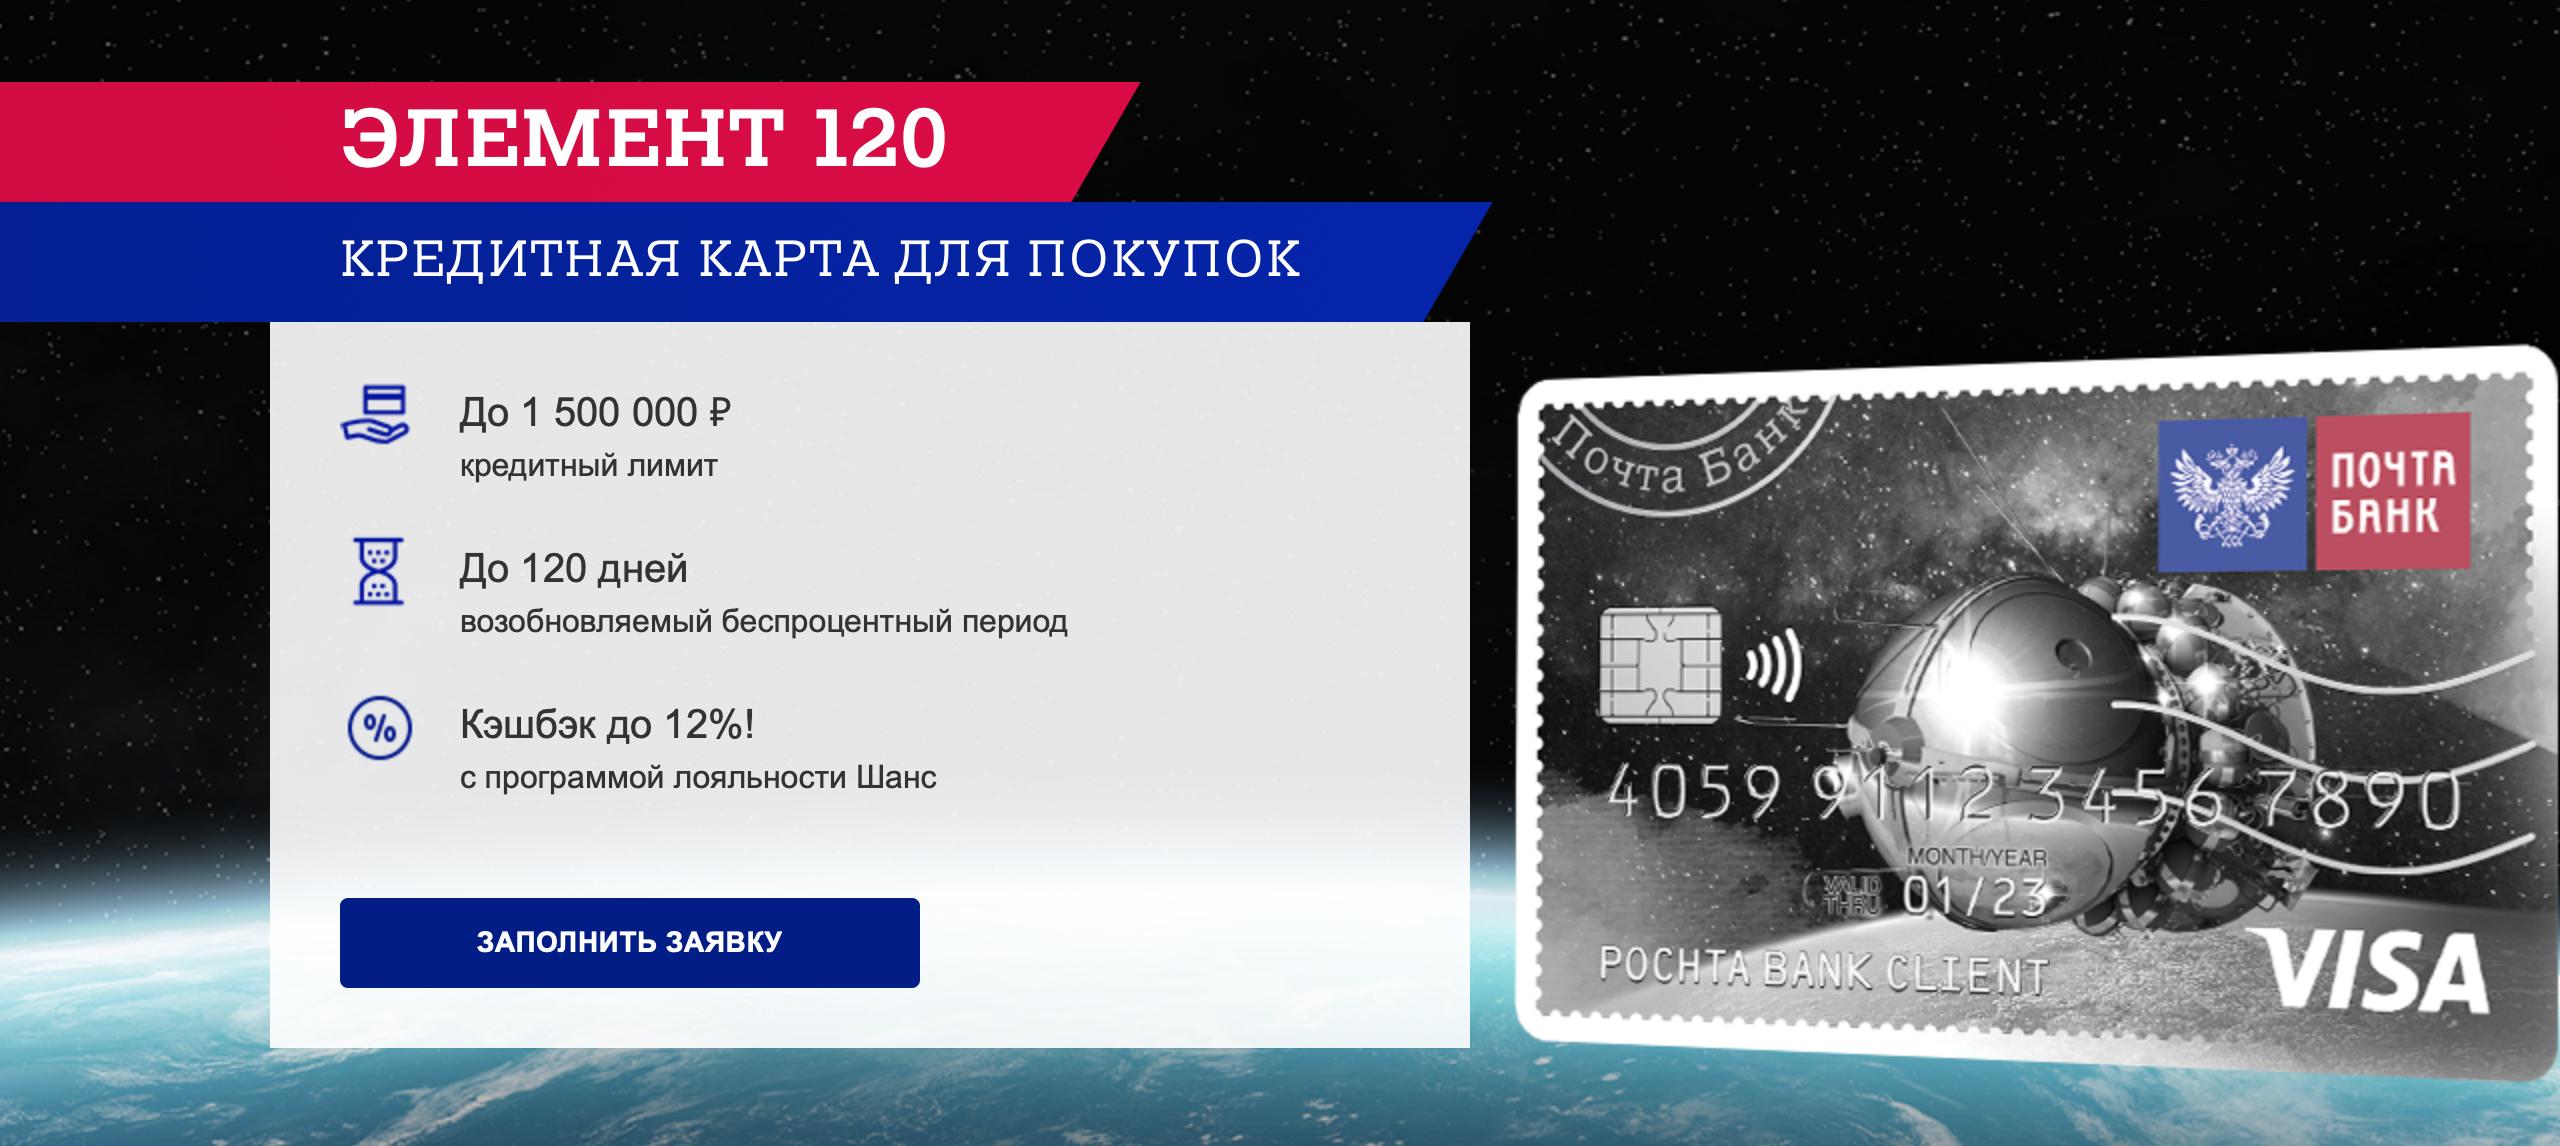 кредитная карта 120 дней реклама